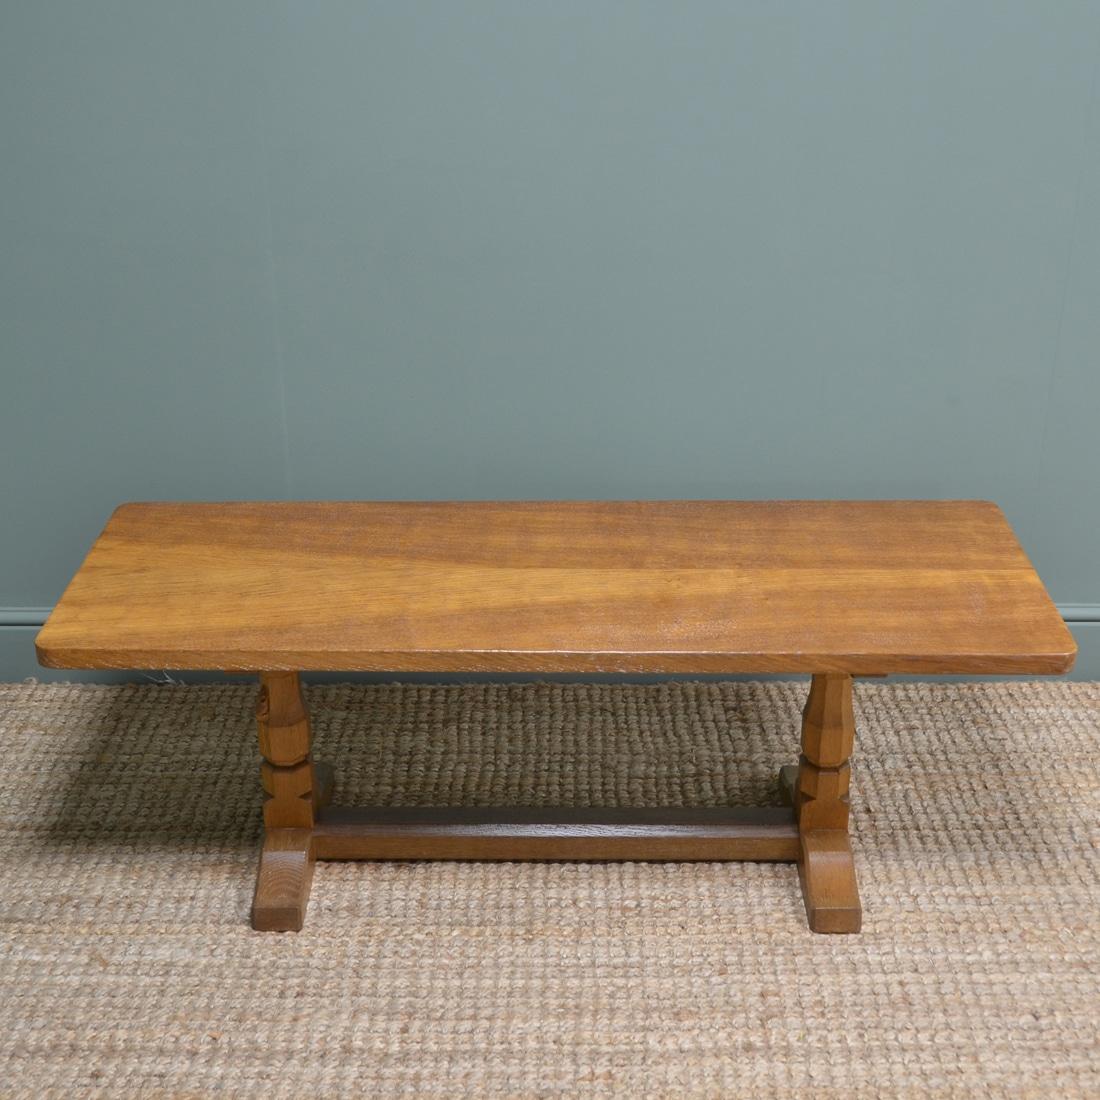 Solid Oak Mouseman Refectory Coffee Table